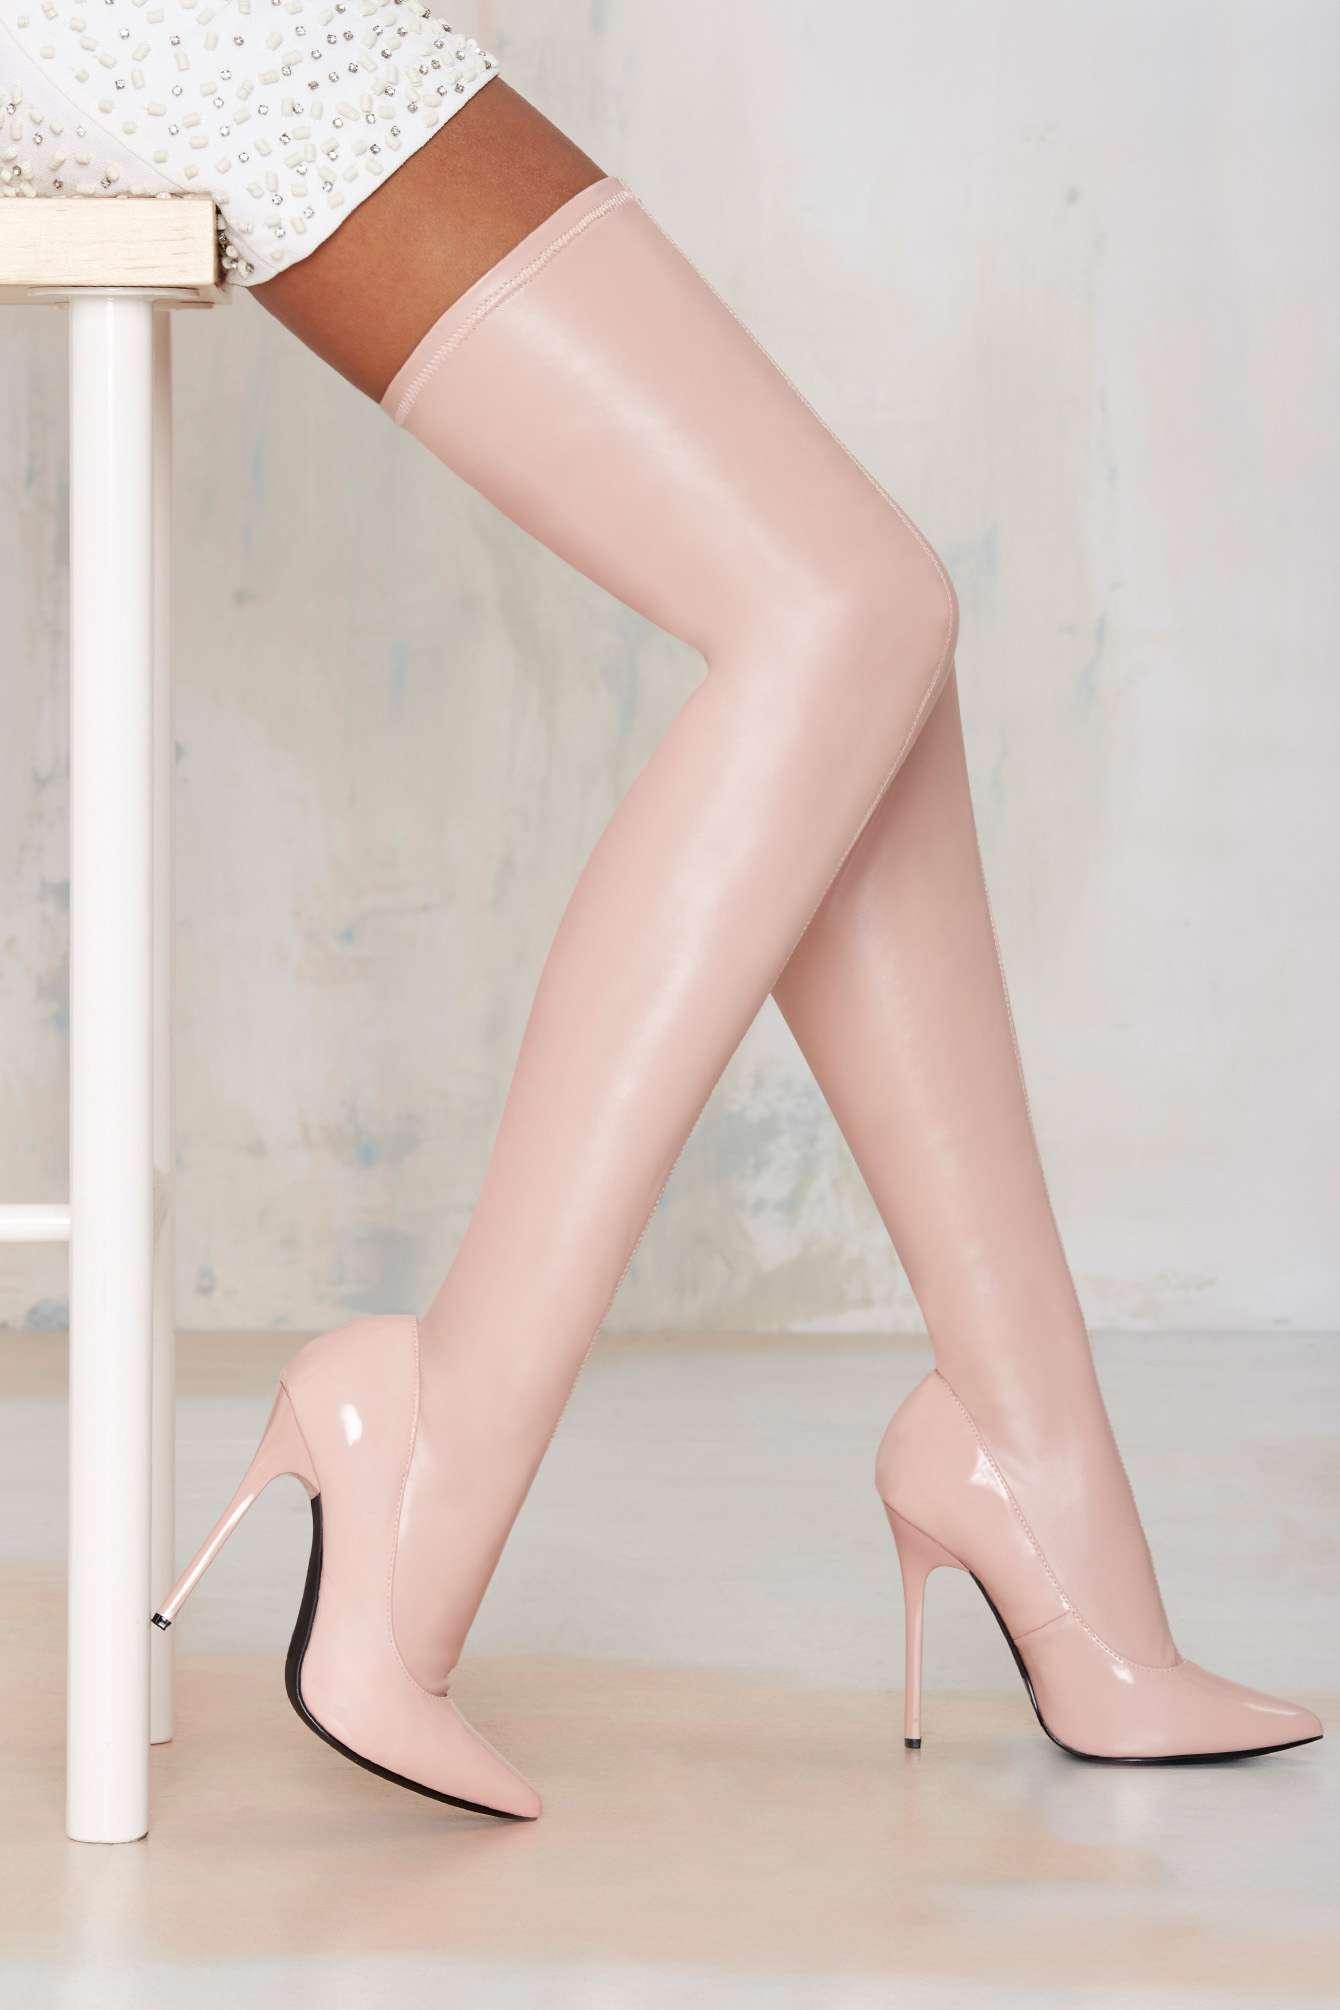 silver_girl_pink_fantasy_nasty_gal_4.jpg